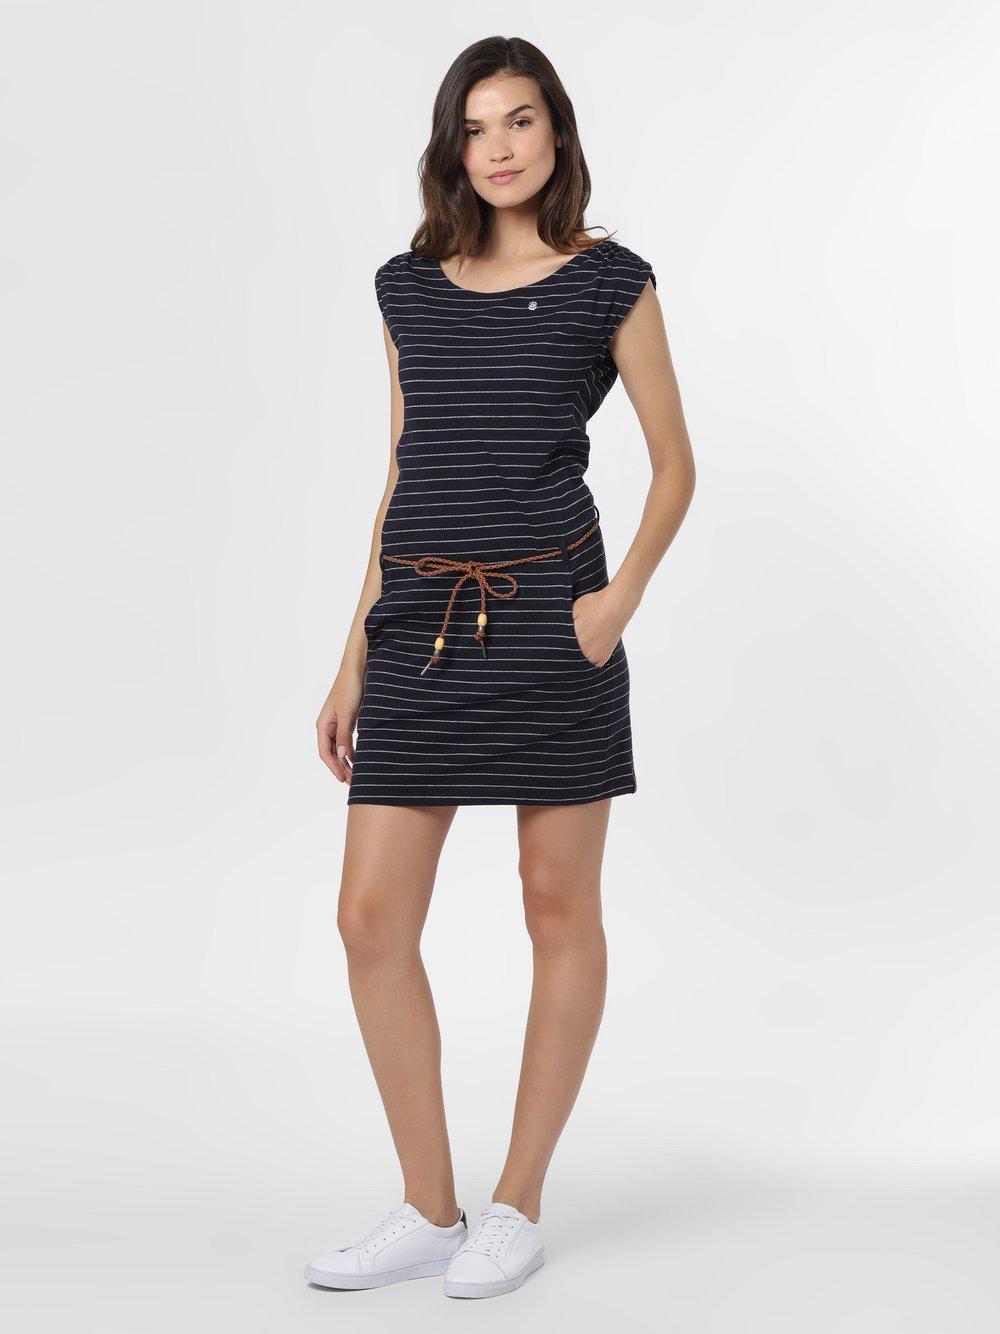 Ragwear – Sukienka damska – Chego, niebieski Van Graaf 467433-0001-09900